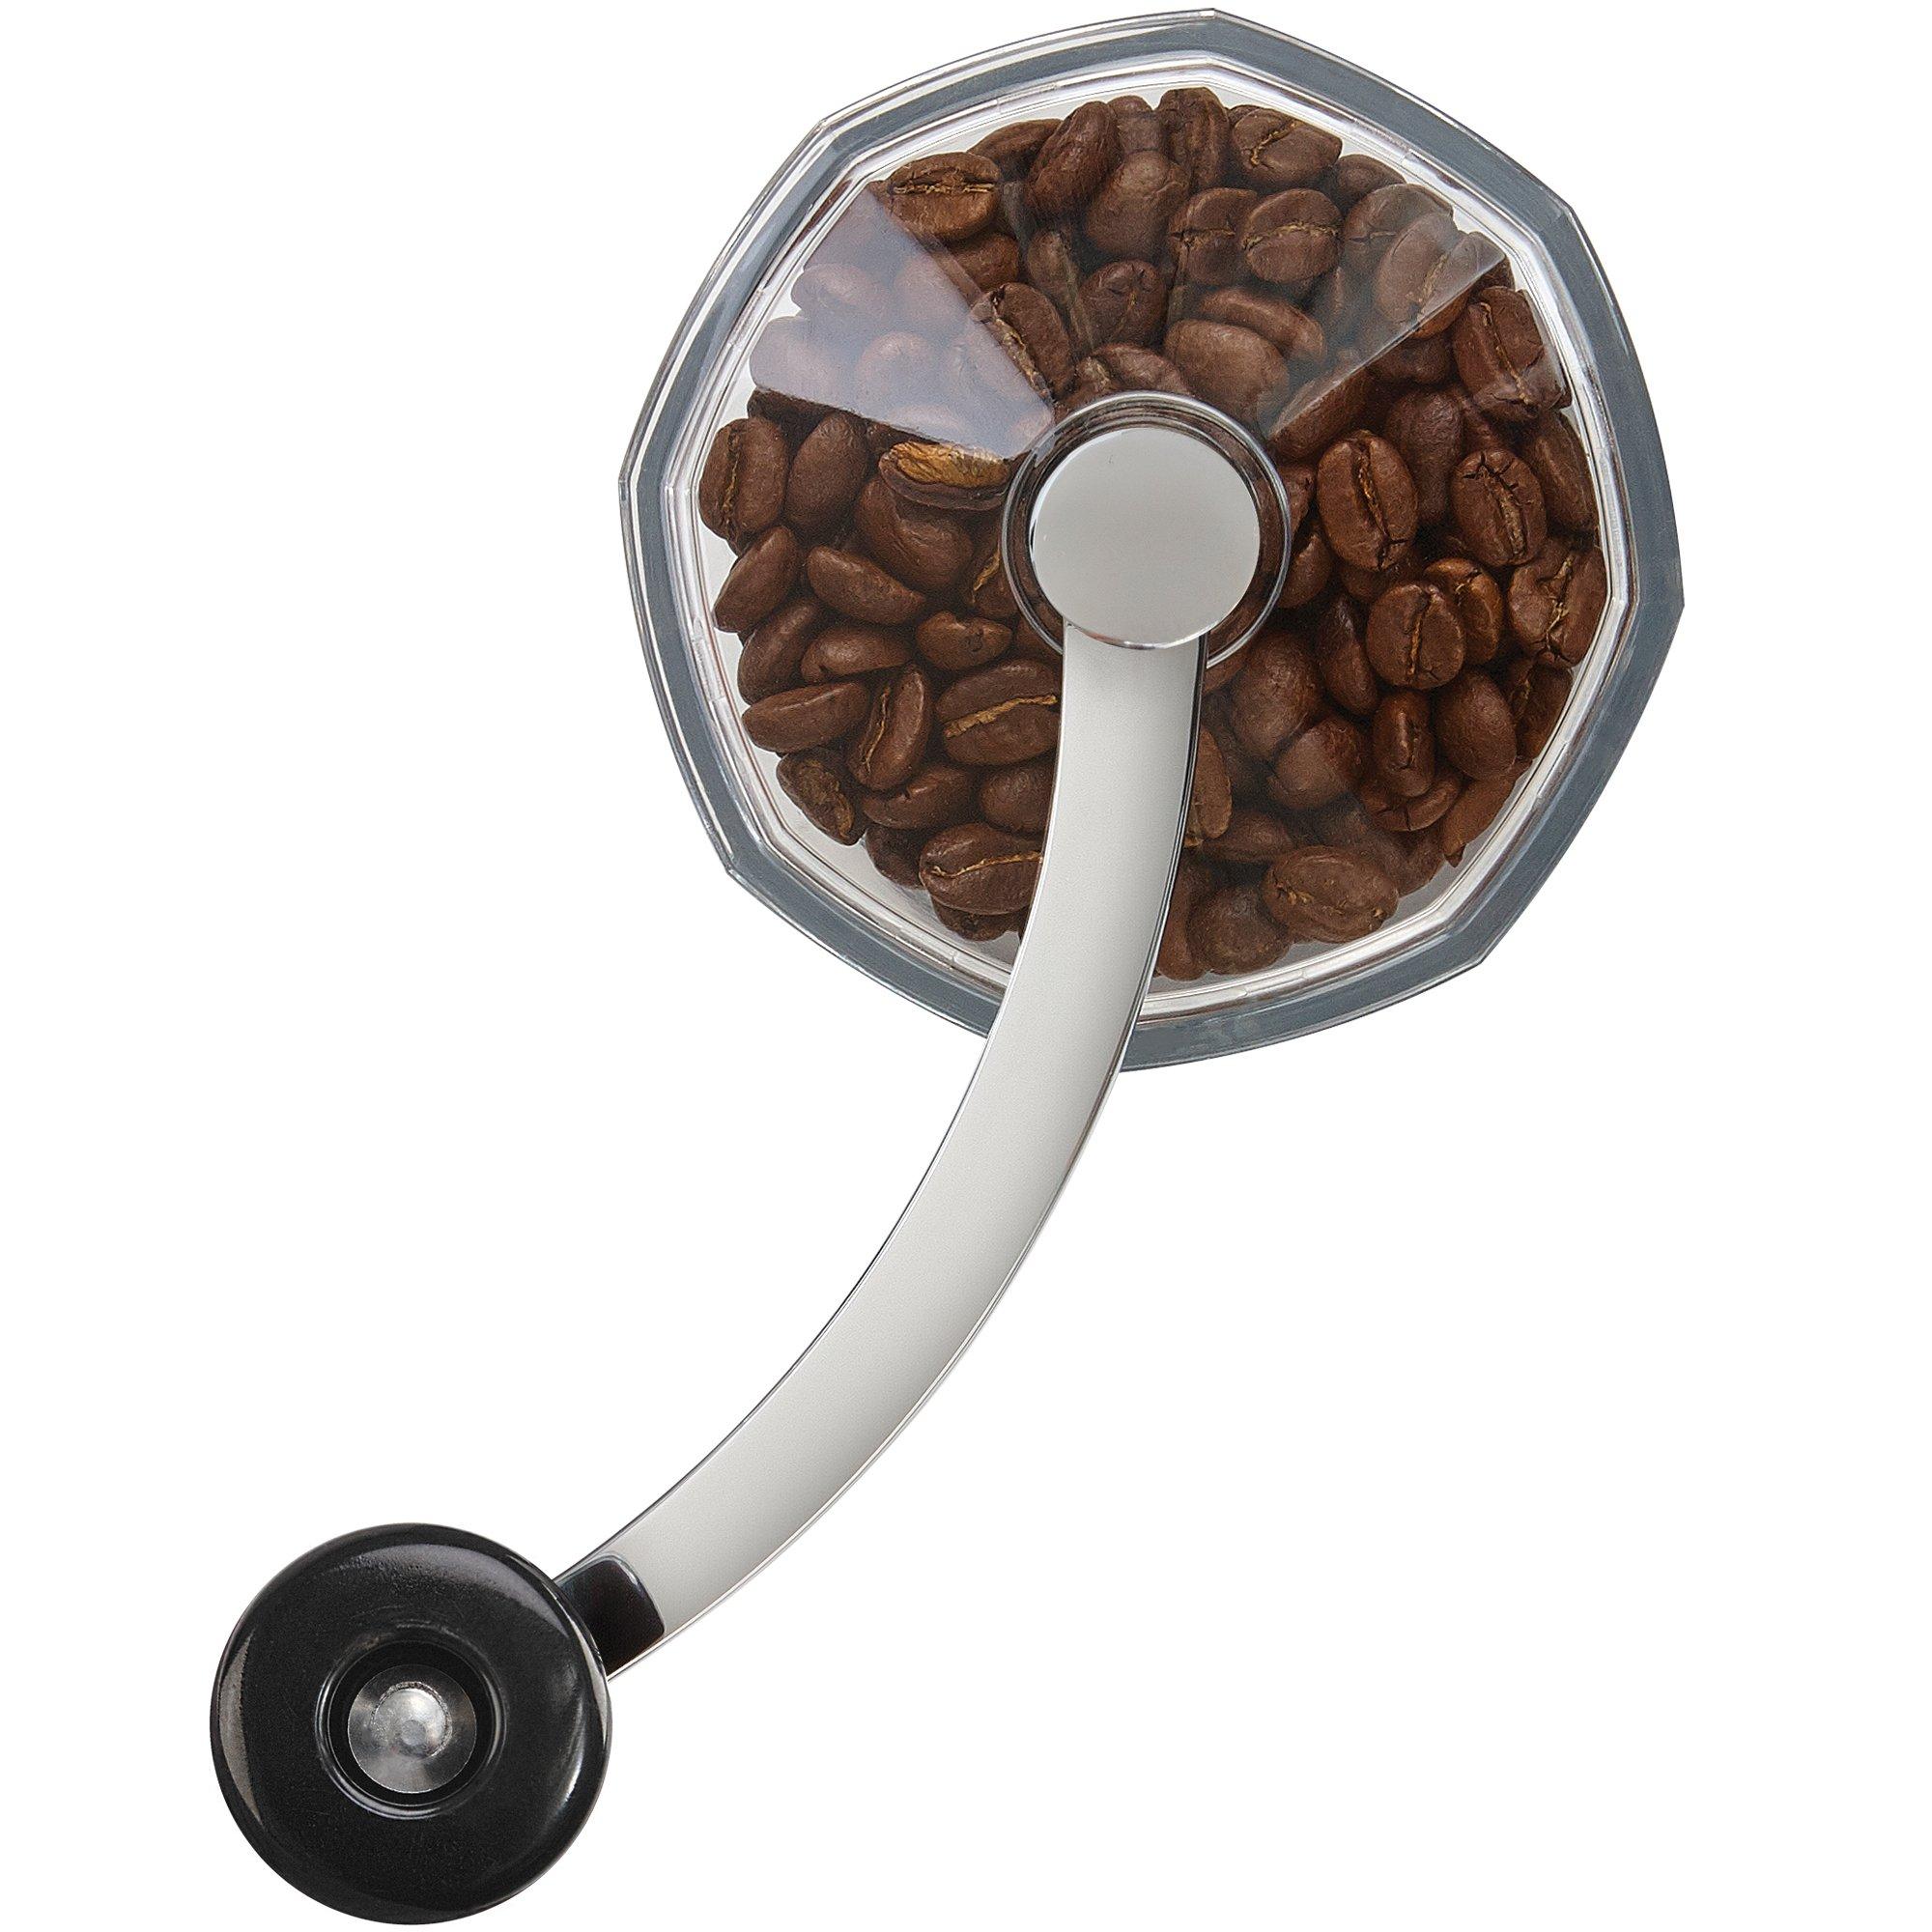 Bialetti Manual Coffee Grinder by Bialetti (Image #4)